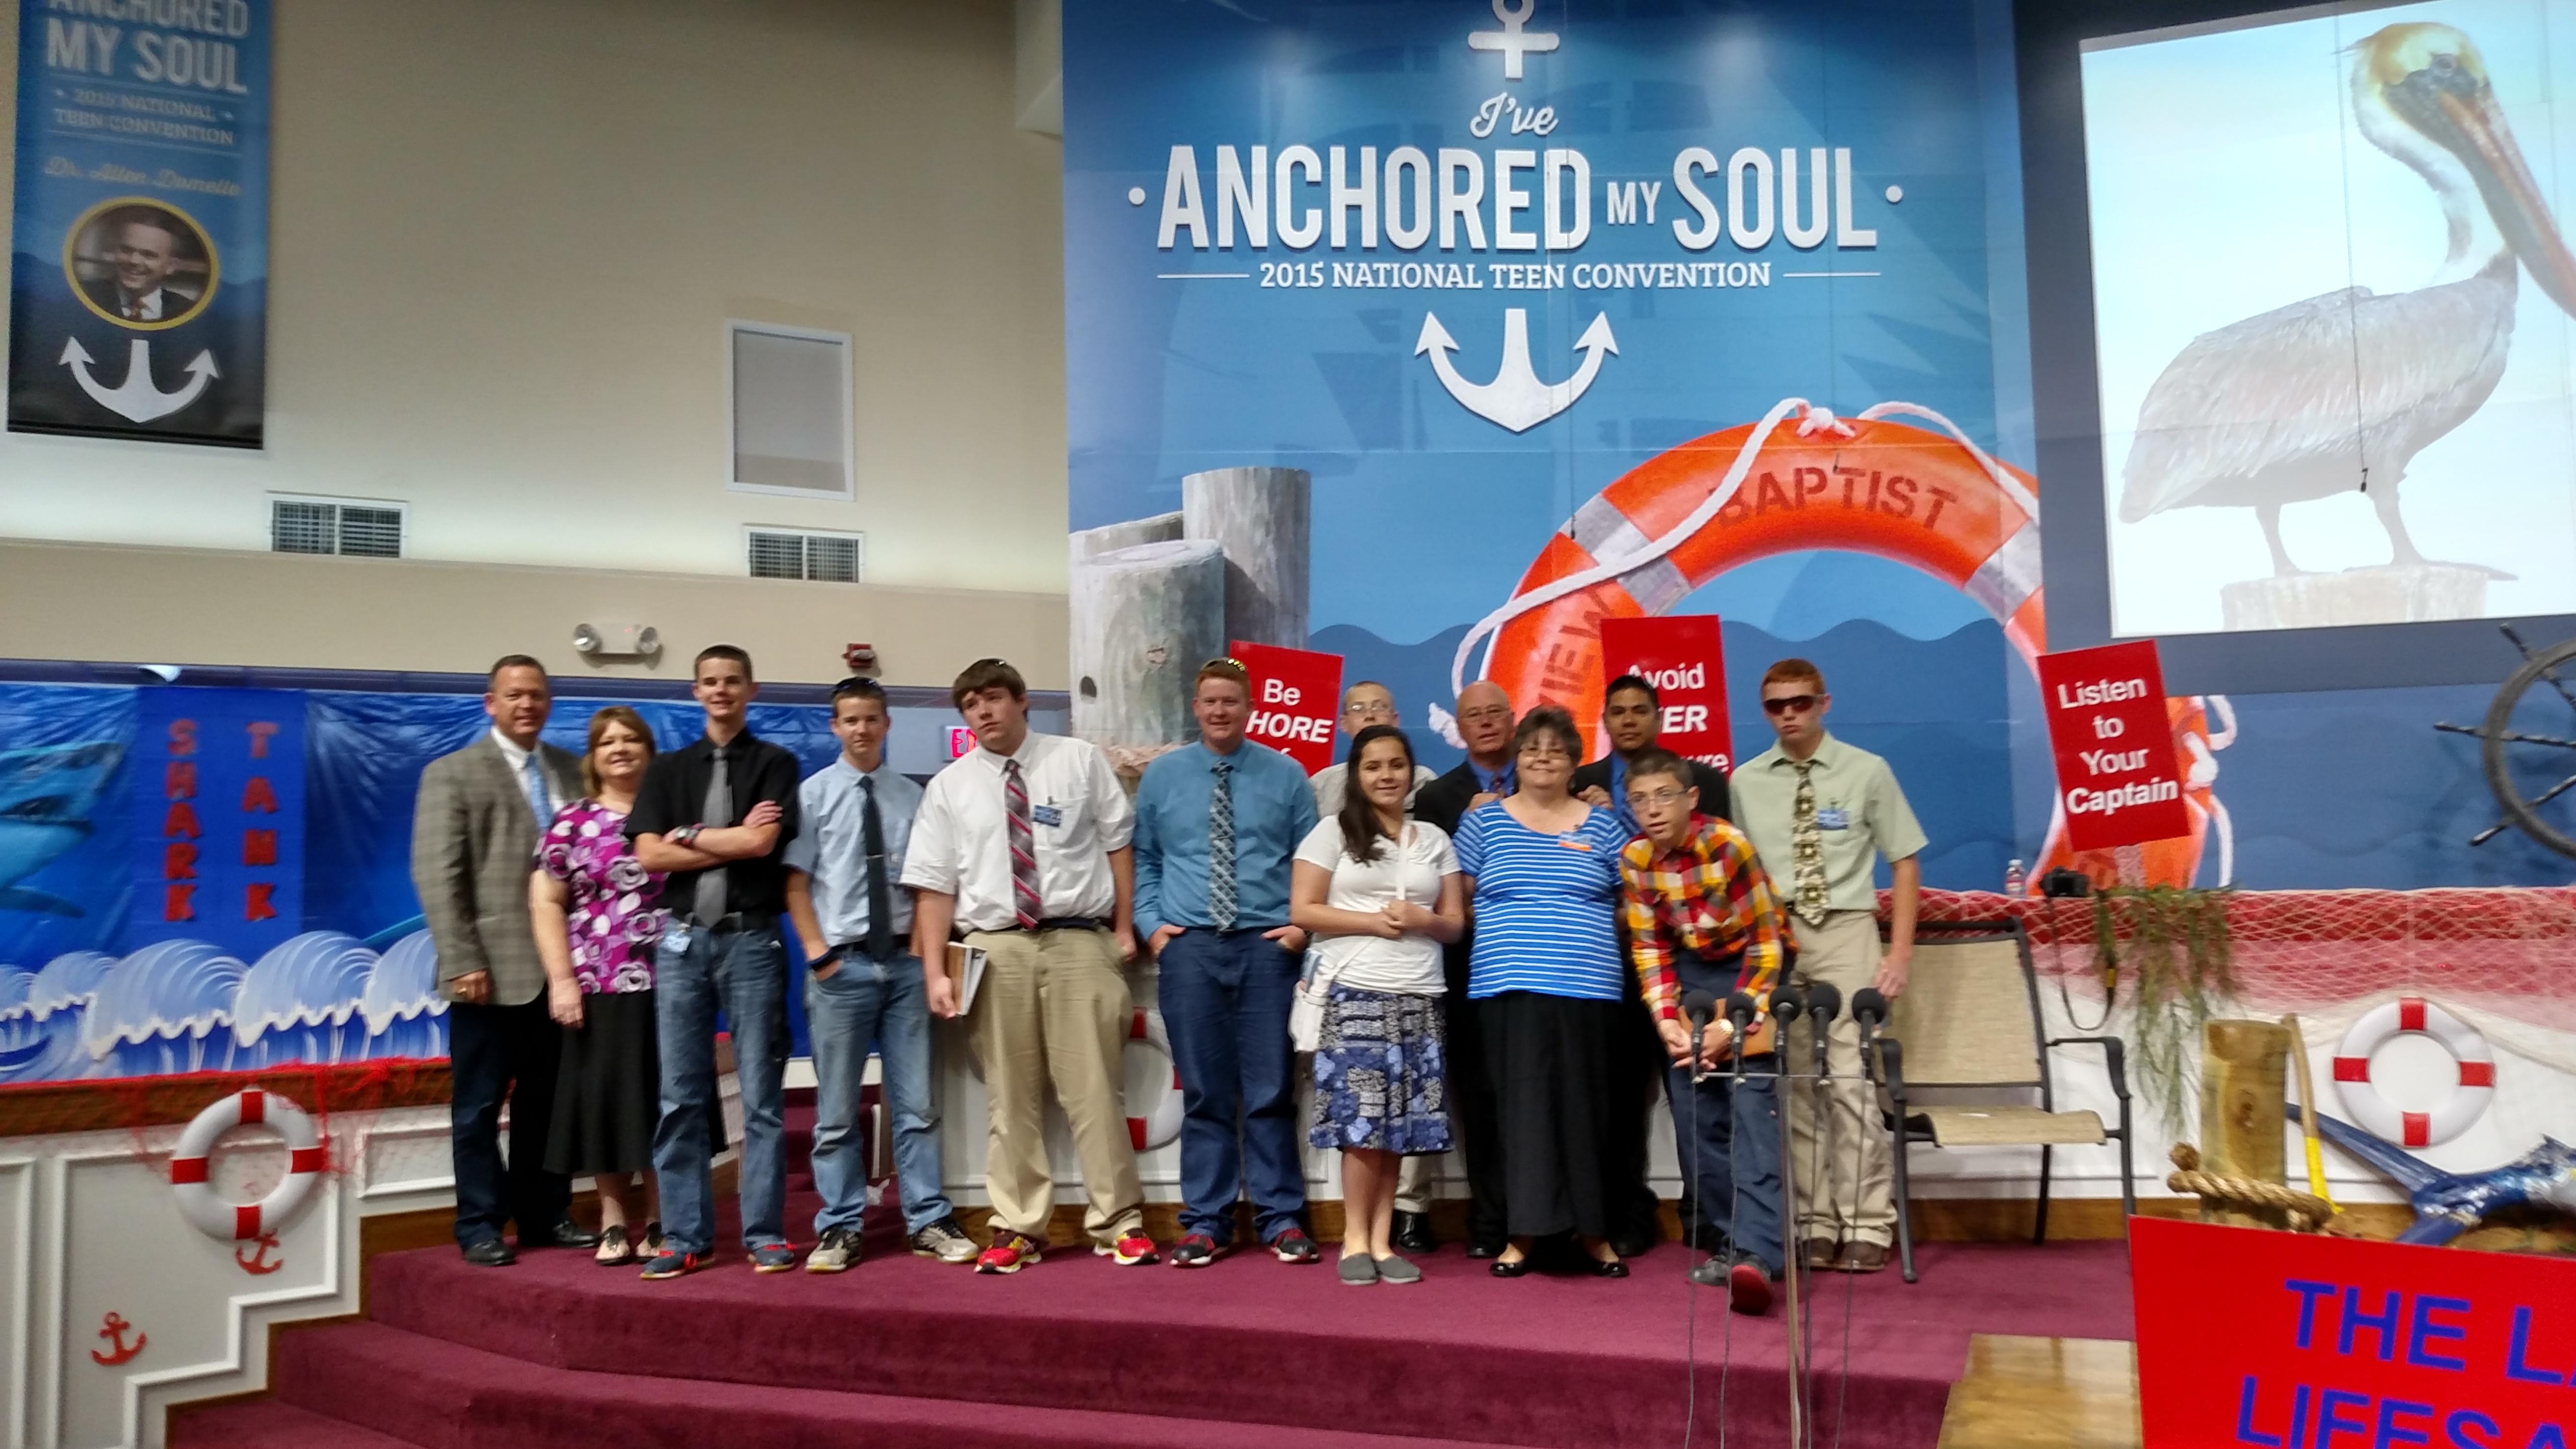 Midland Baptist Church Homline Teens